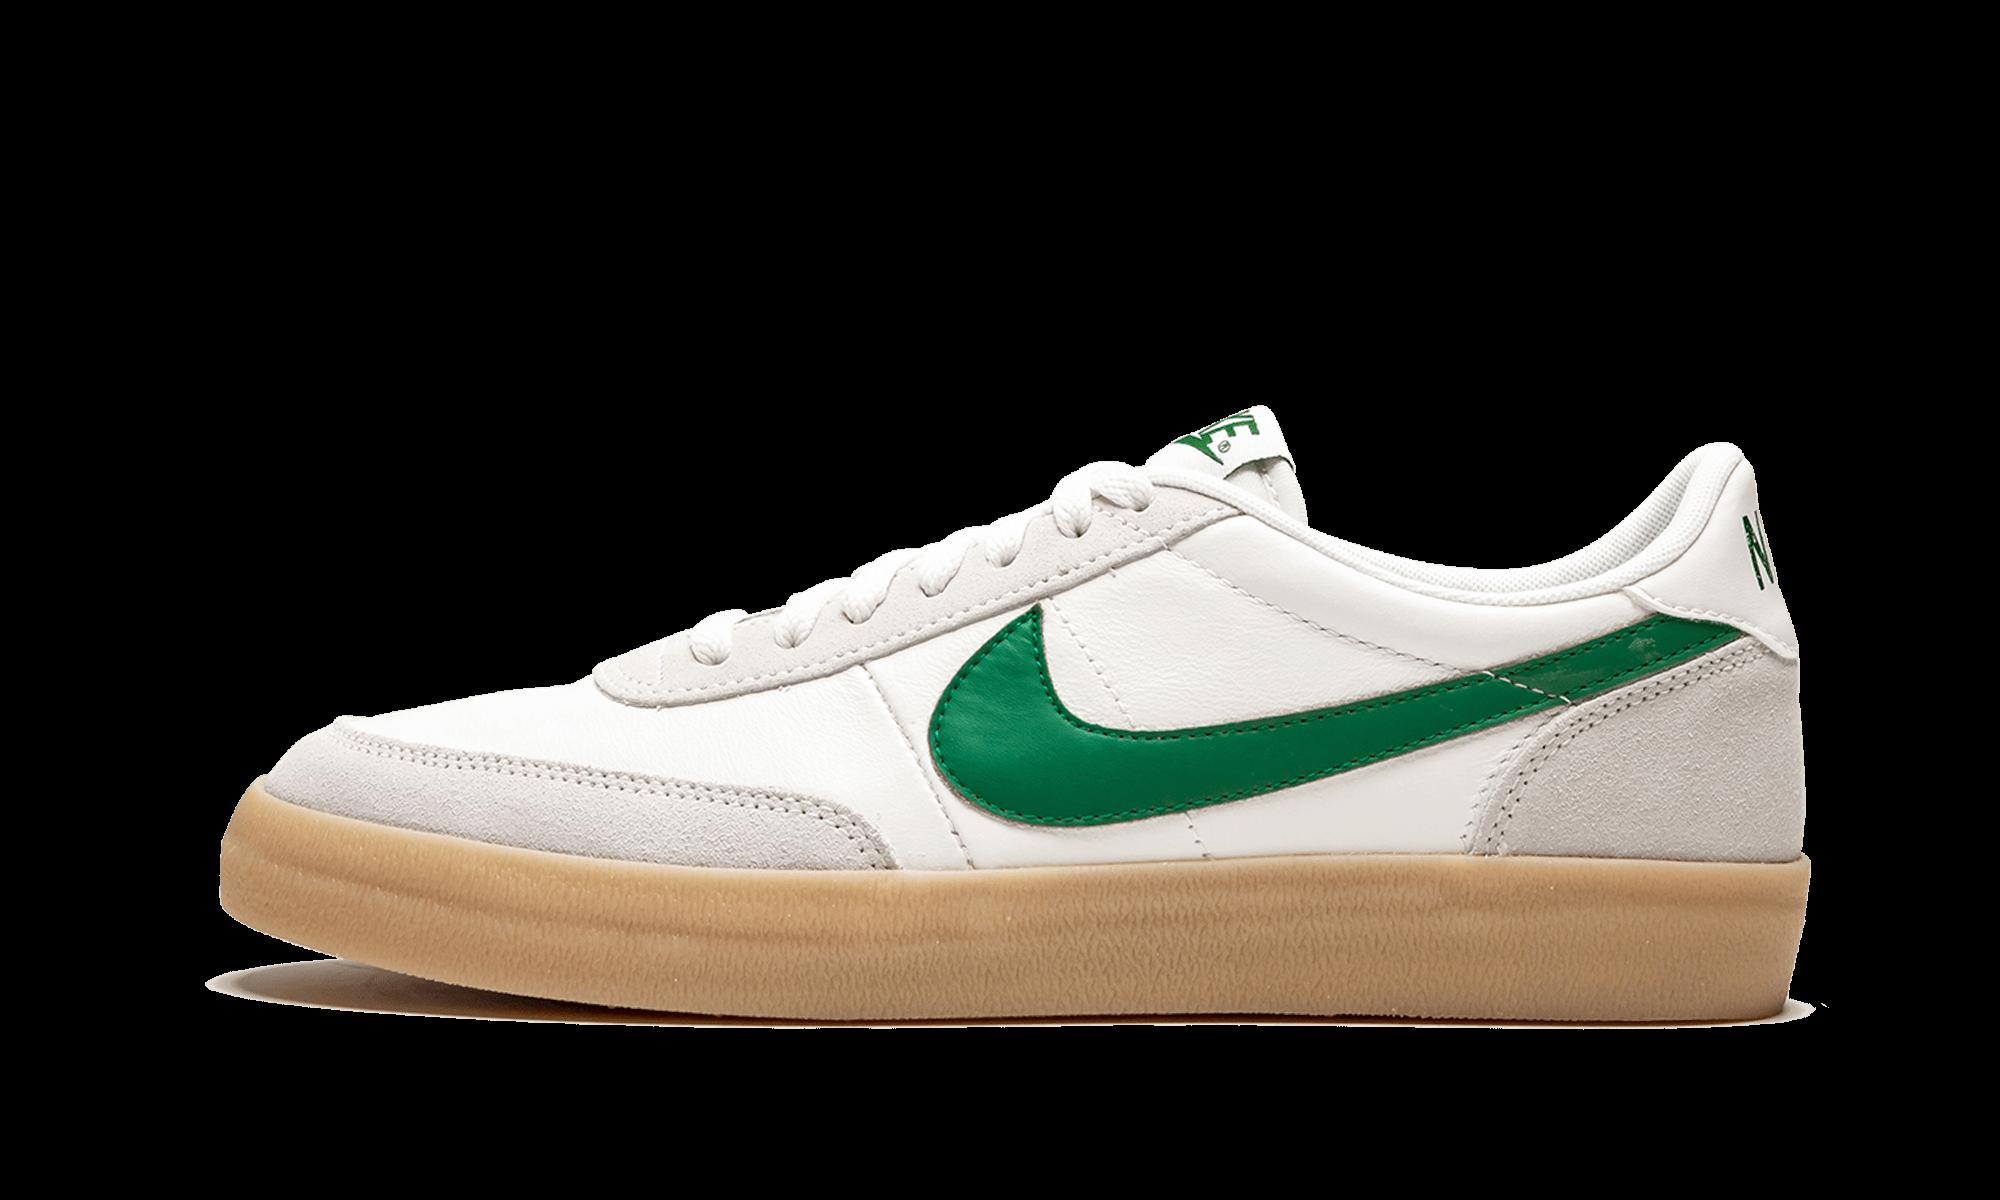 J crew shoes, Nike killshot